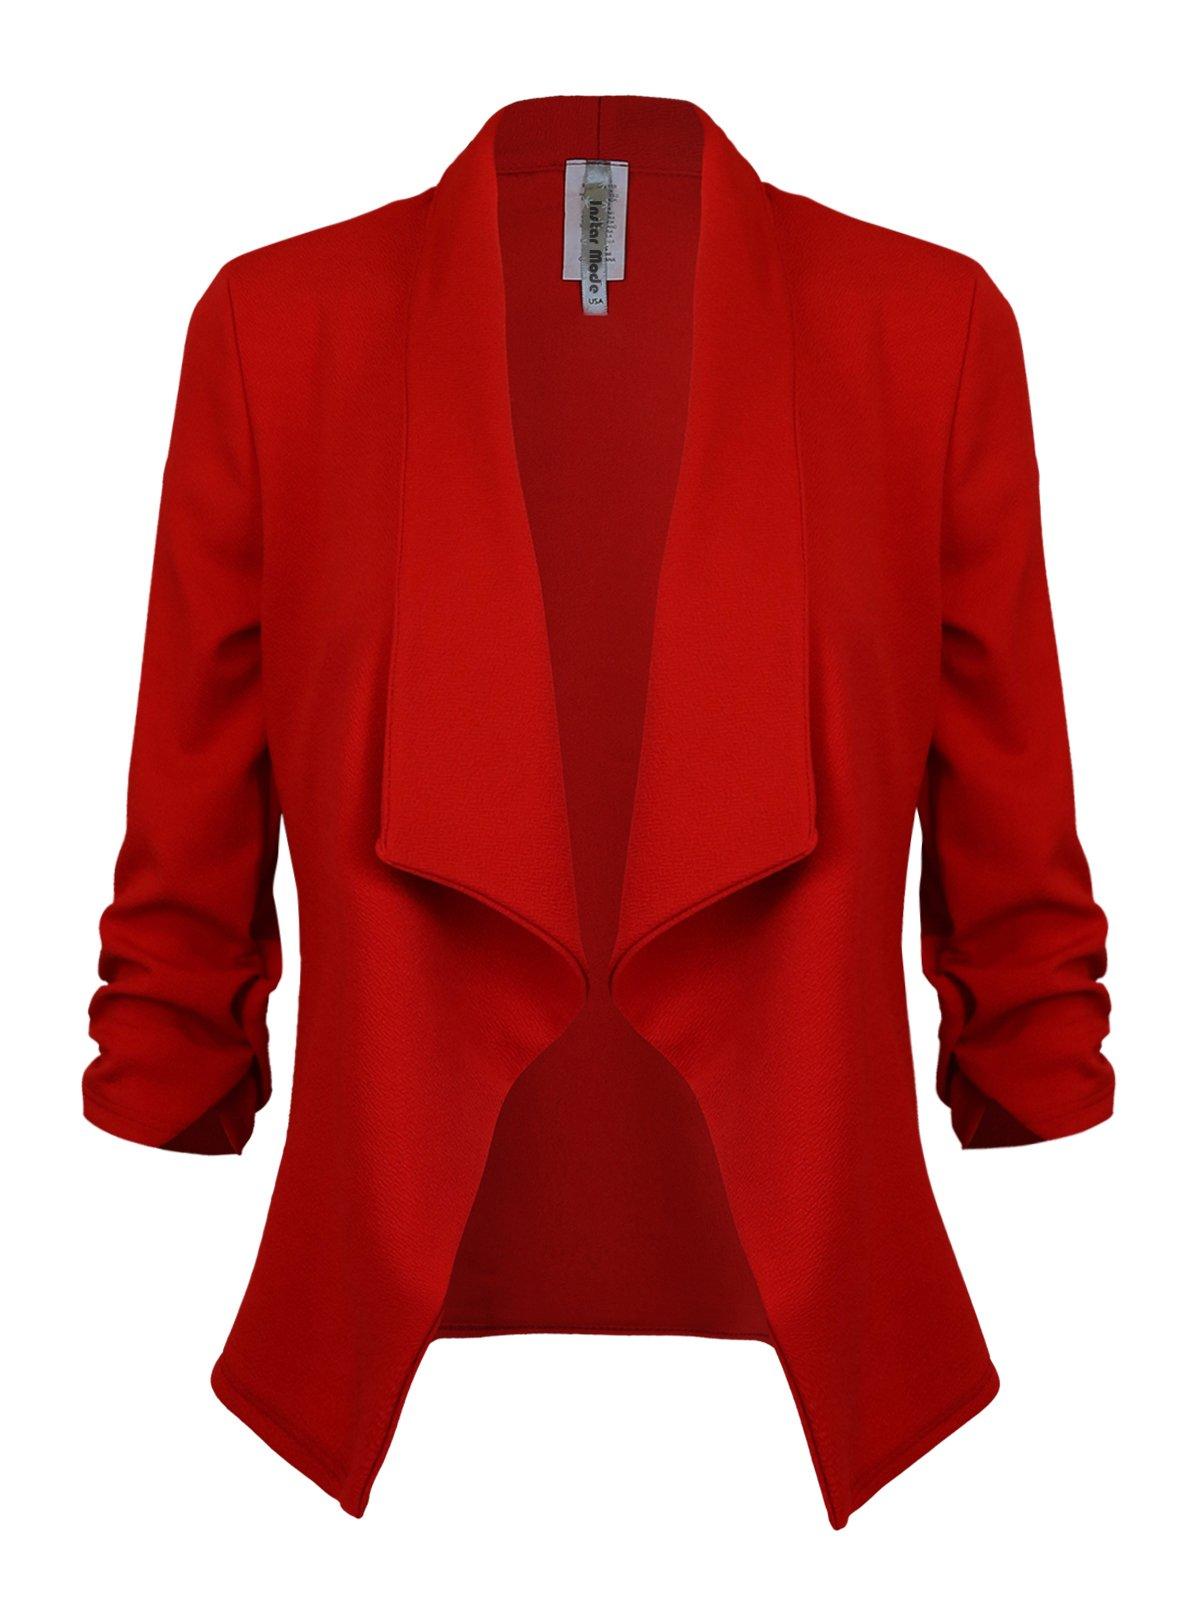 Instar Mode Women's Versatile Business Attire Blazers in Varies Styles (B12316 Red, Large)